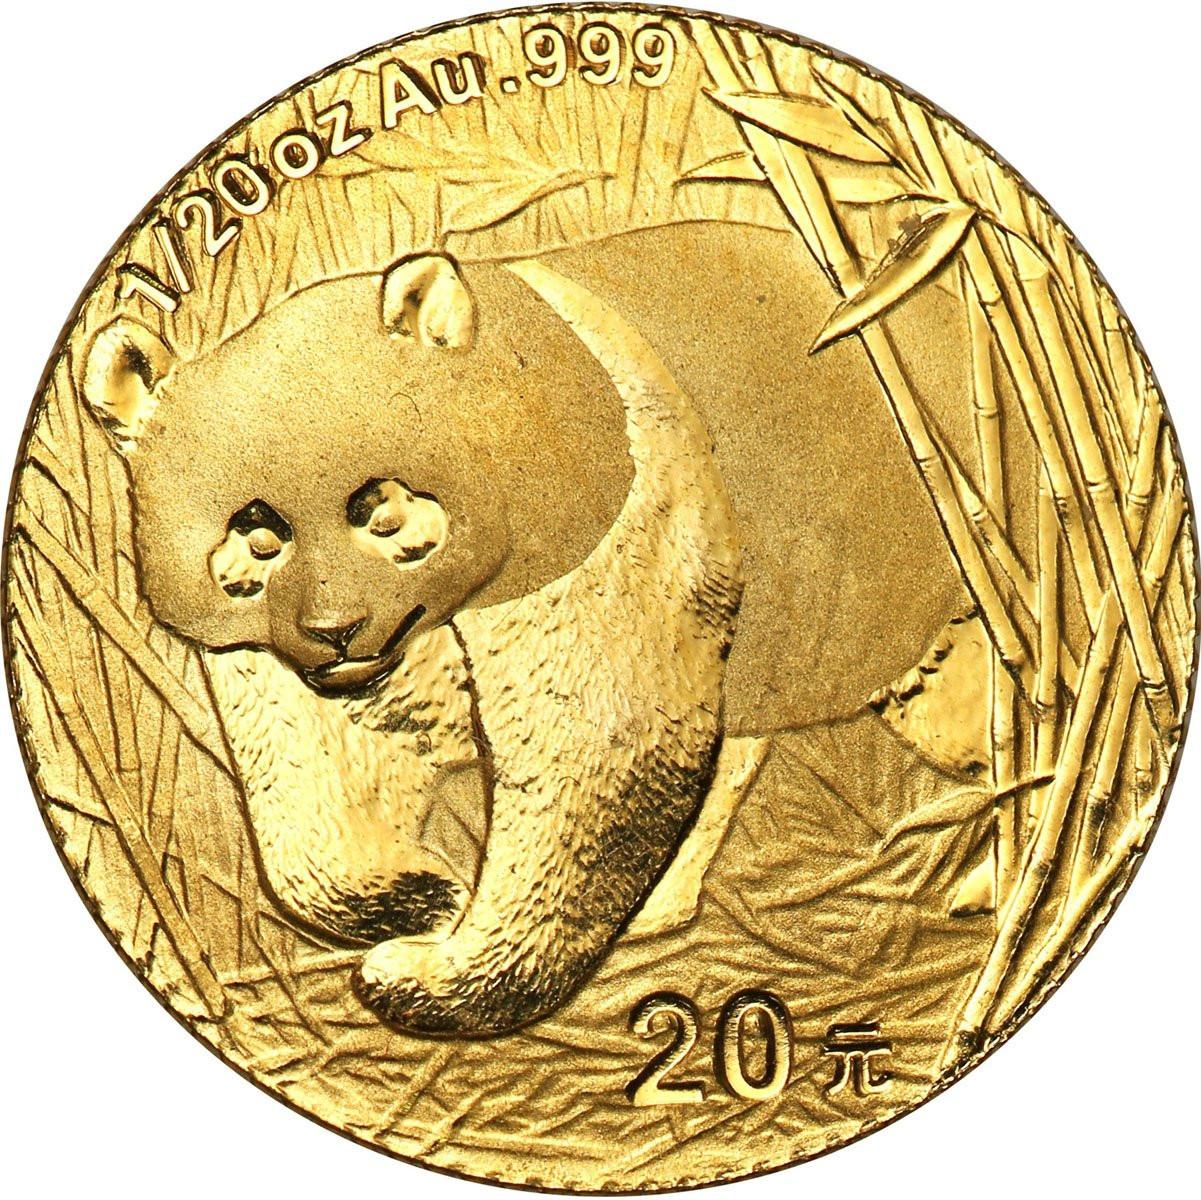 Chiny 20 Yuan 2002 Panda (1/20 uncji Au) st. L